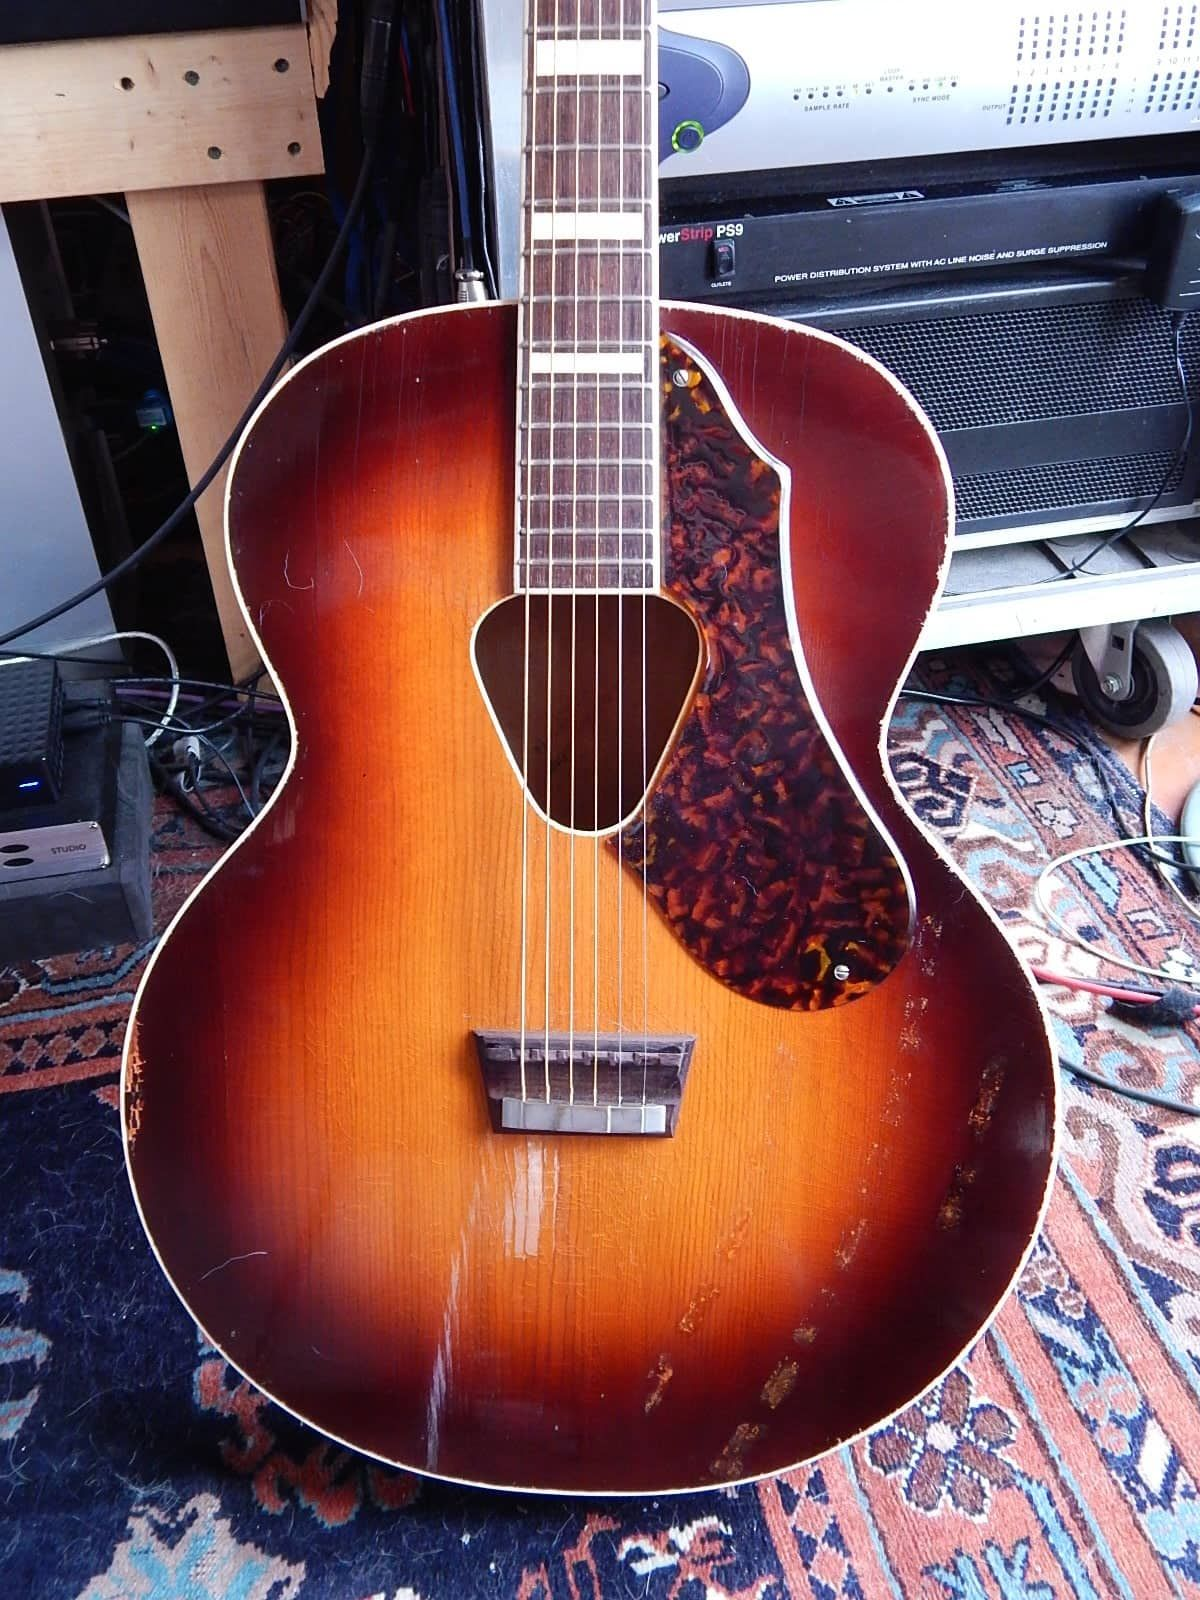 Vintage 1948 Gretsch Synchromatic 75 Flat Top Acoustic Guitar East Hoosick Vintage Guitars Reverb Guitar Acoustic Guitar Acoustic